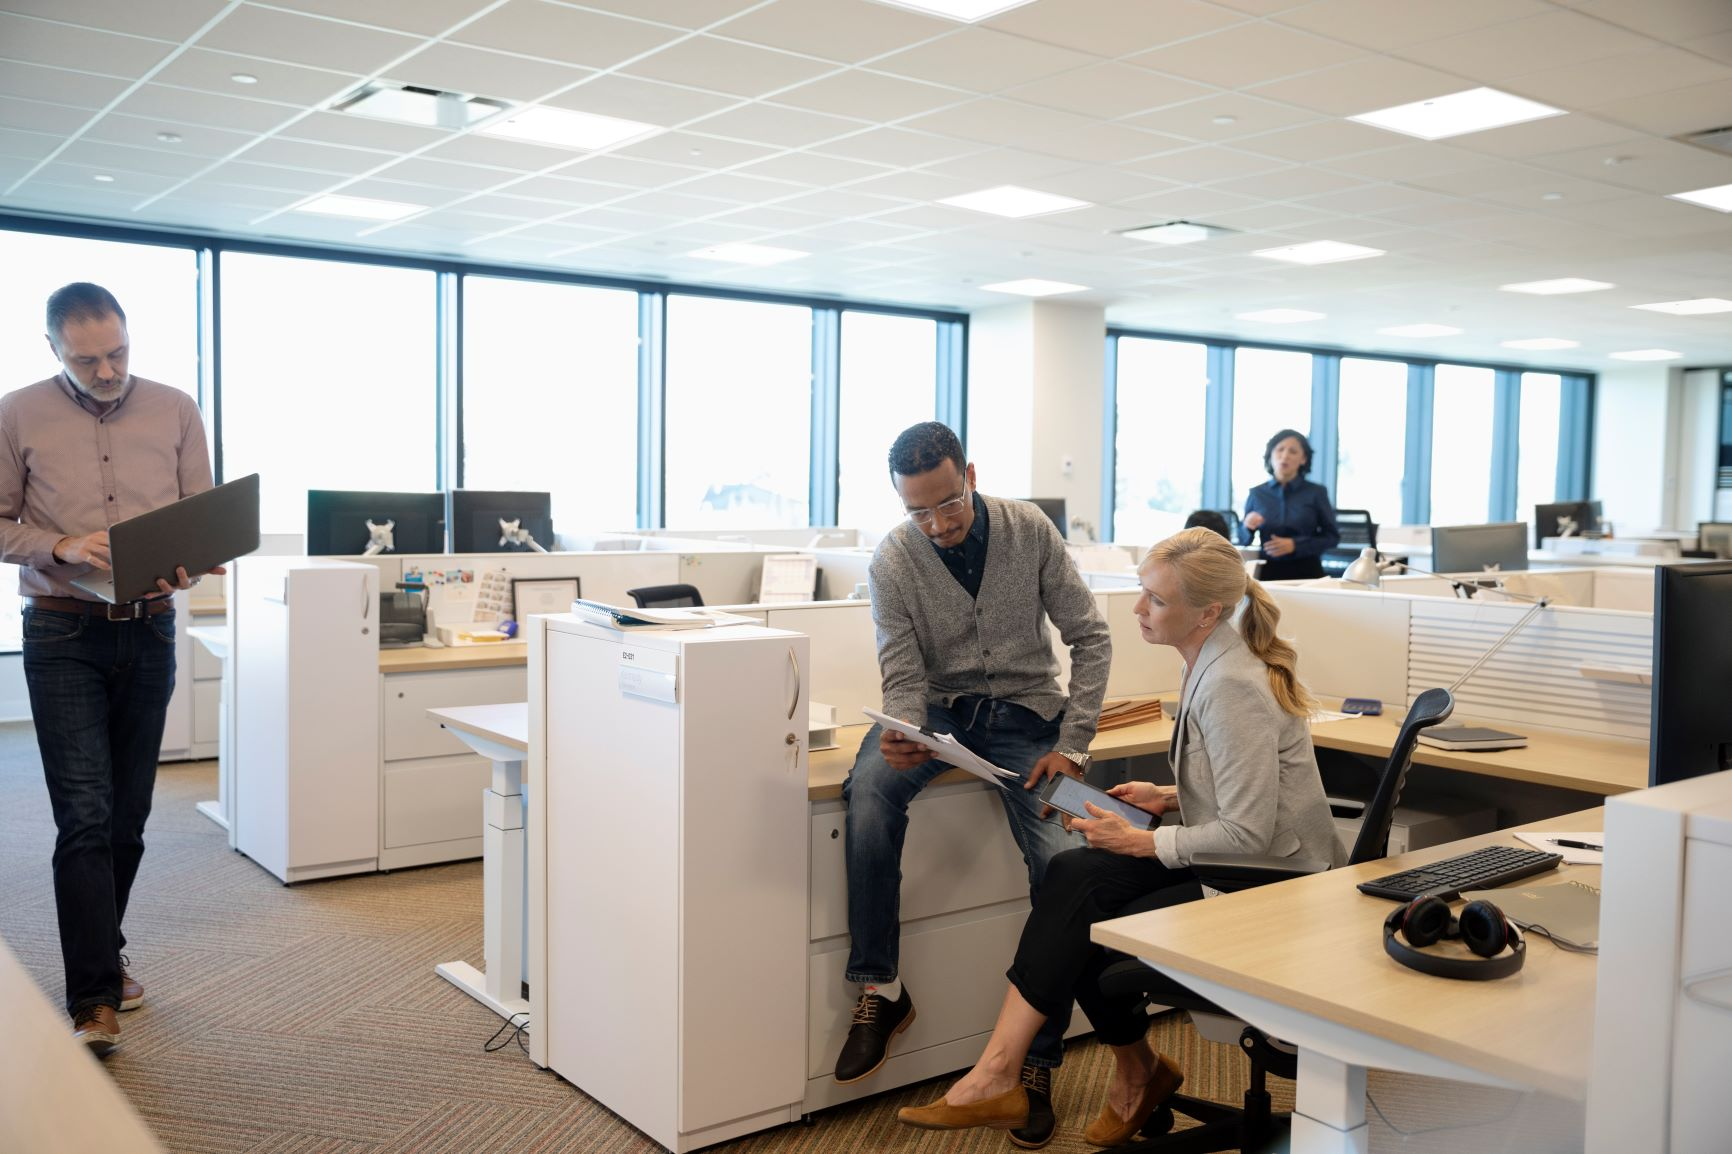 LTHI-RA-81 -002 - Office cubicles-res7.jpg